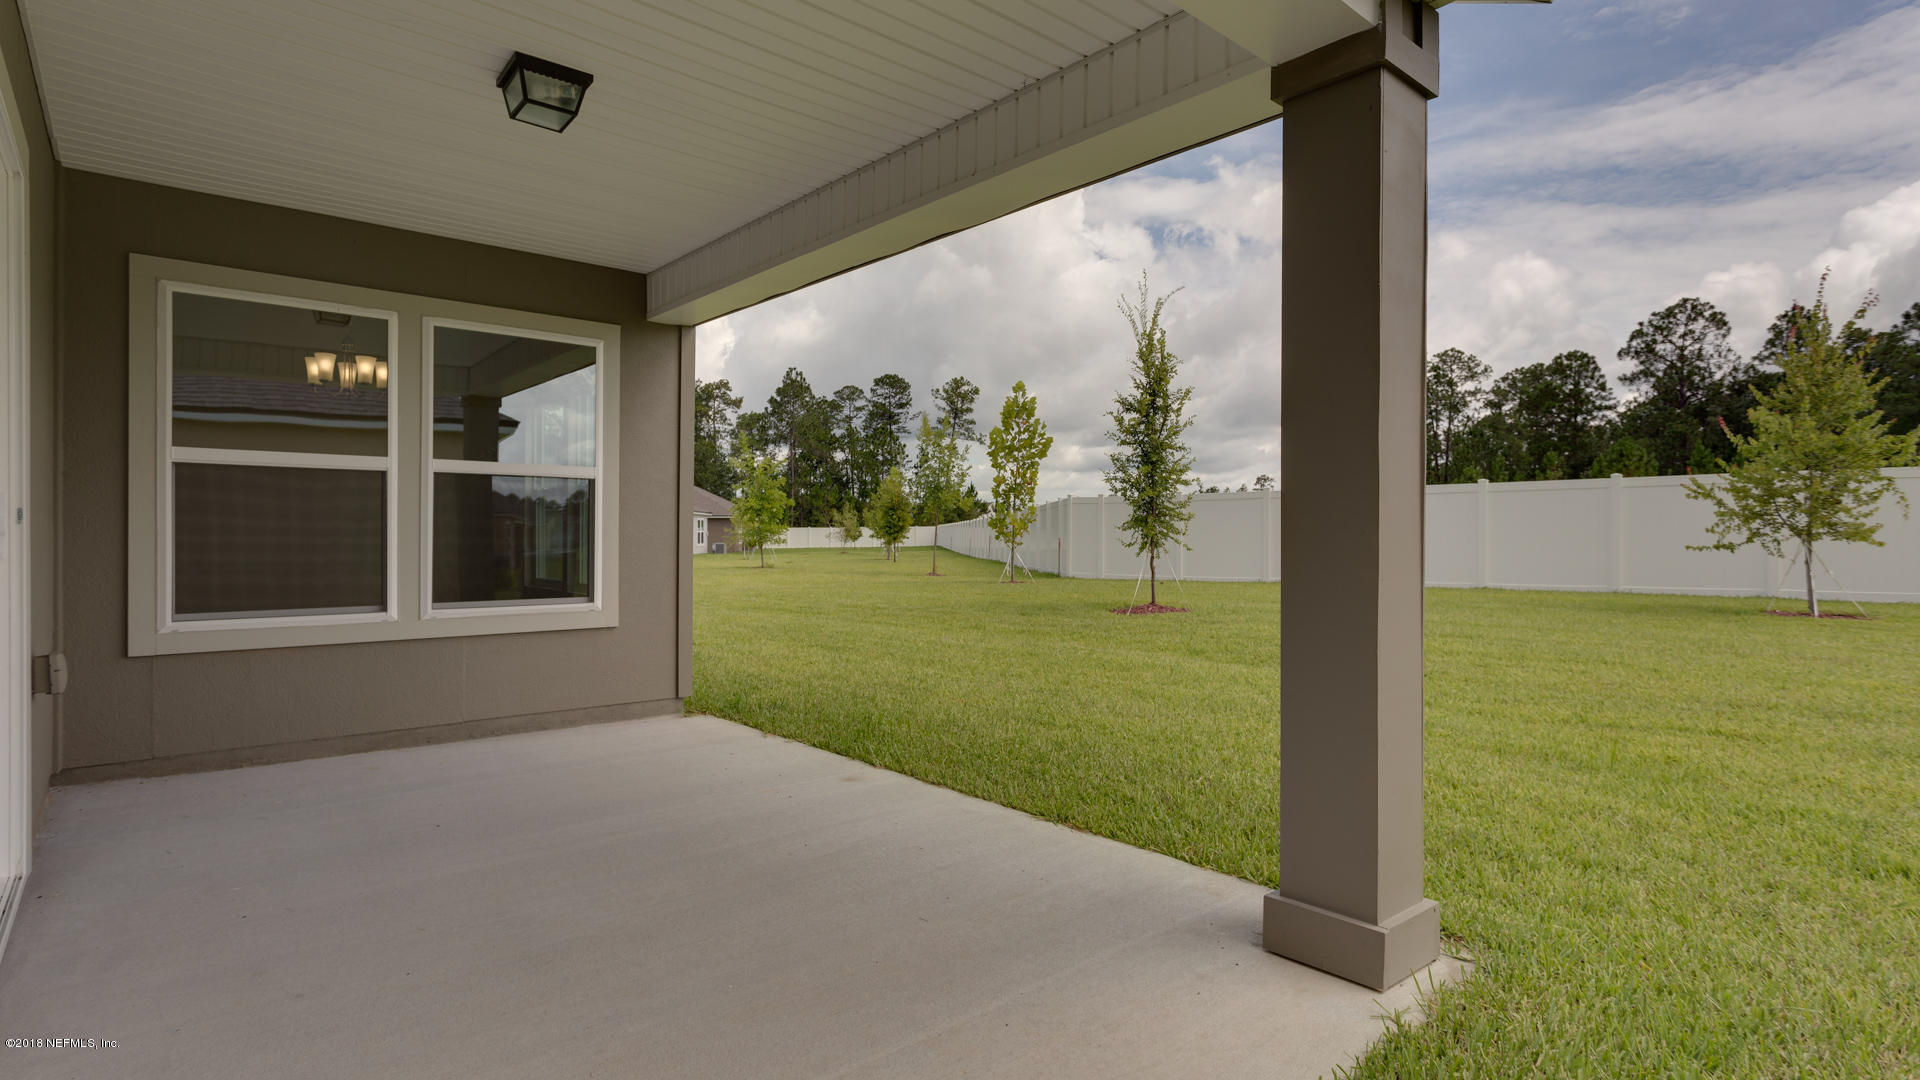 4124 SPRING CREEK, MIDDLEBURG, FLORIDA 32068, 3 Bedrooms Bedrooms, ,2 BathroomsBathrooms,Residential - single family,For sale,SPRING CREEK,909253